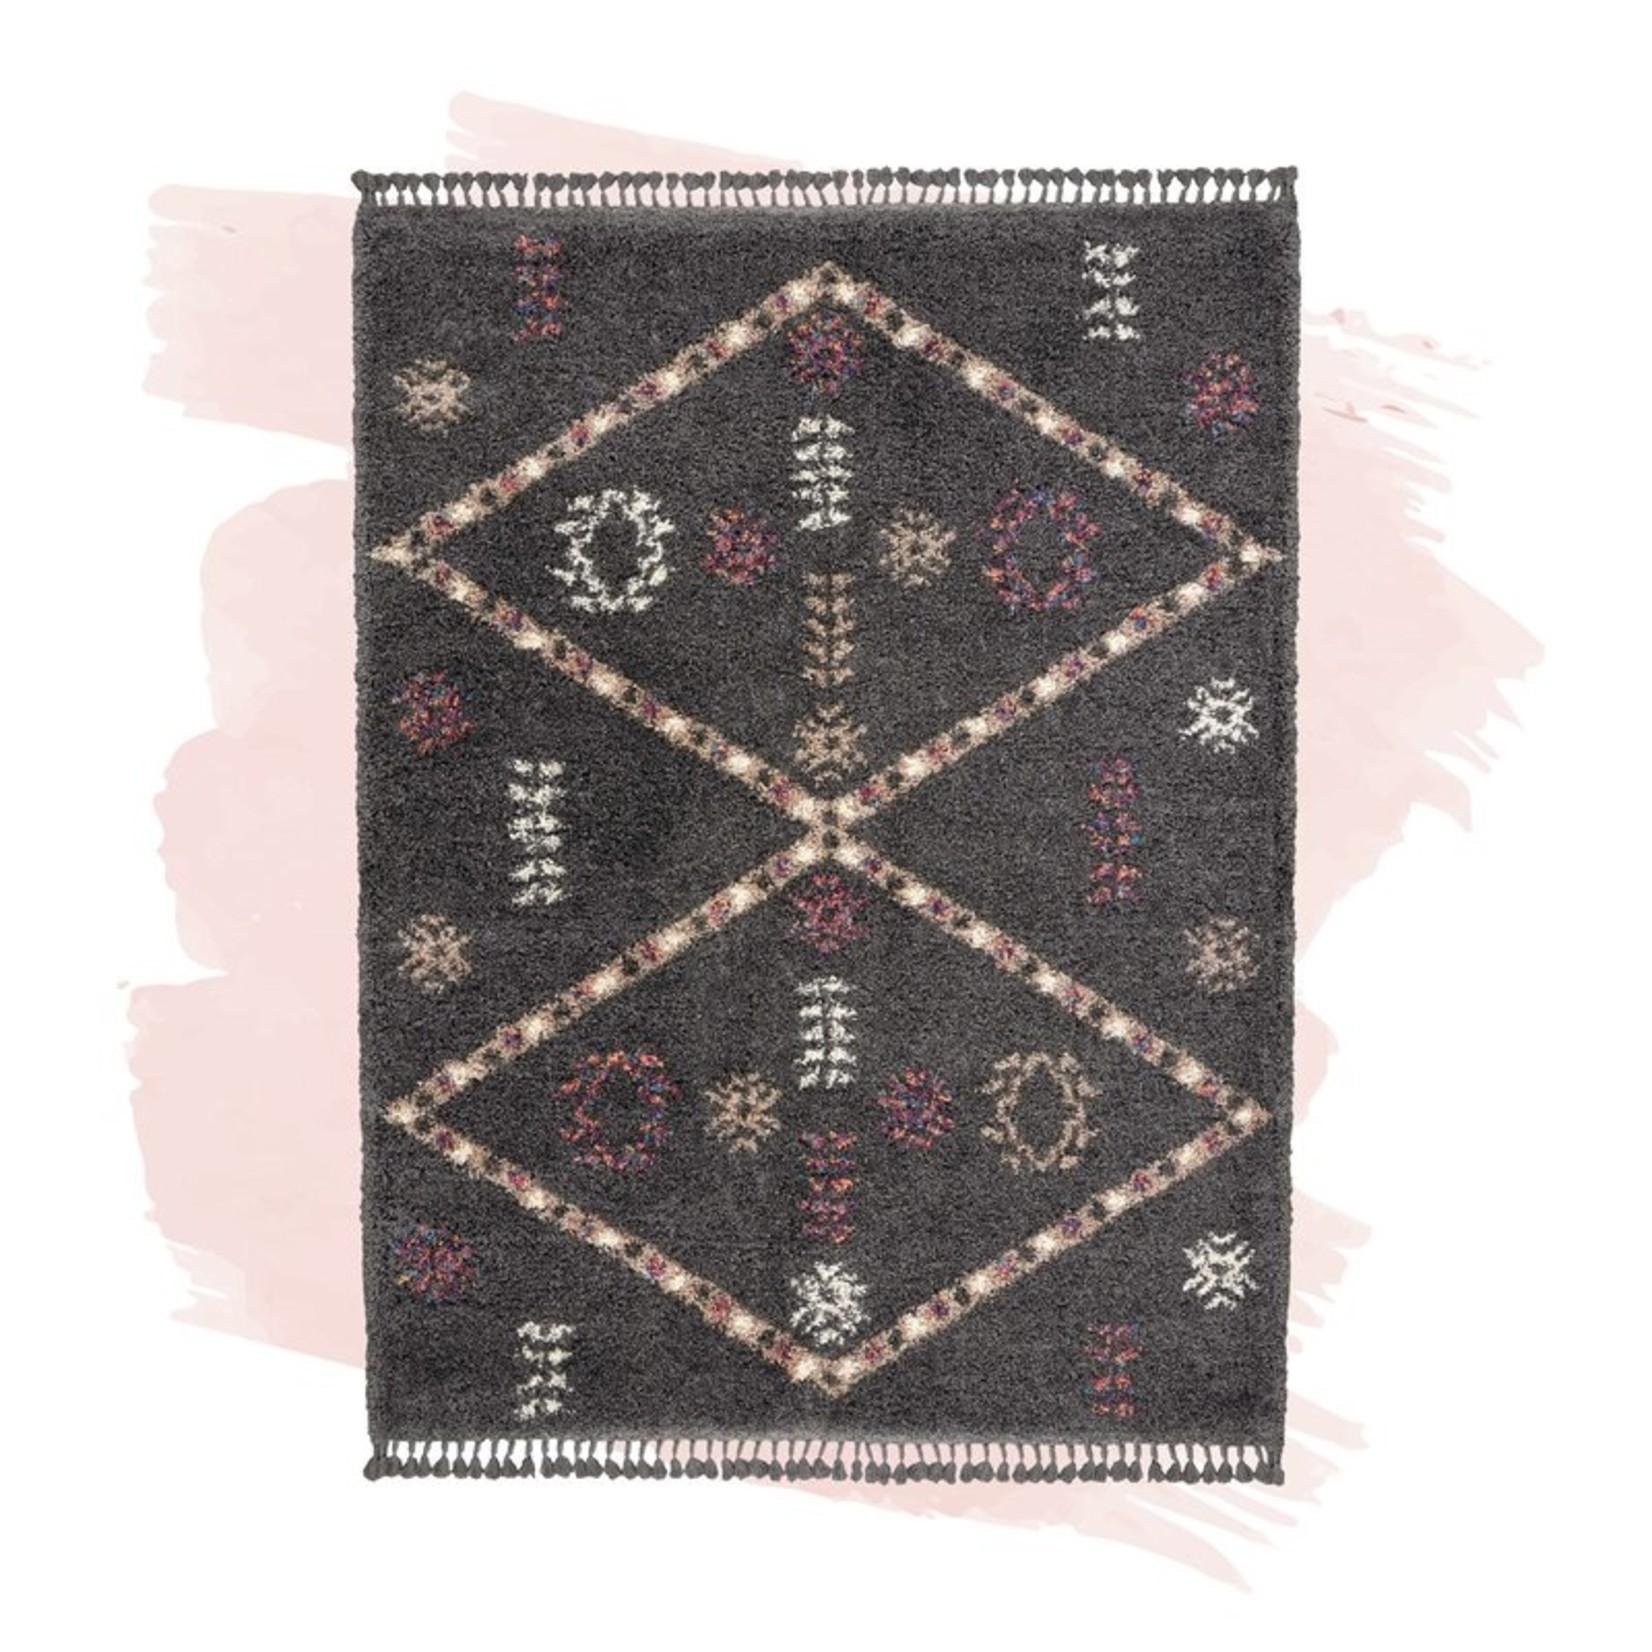 "*4' x 6'3"" - Coby Bohemian Tribal Southwestern Shag Gray/Cream Area Rug"